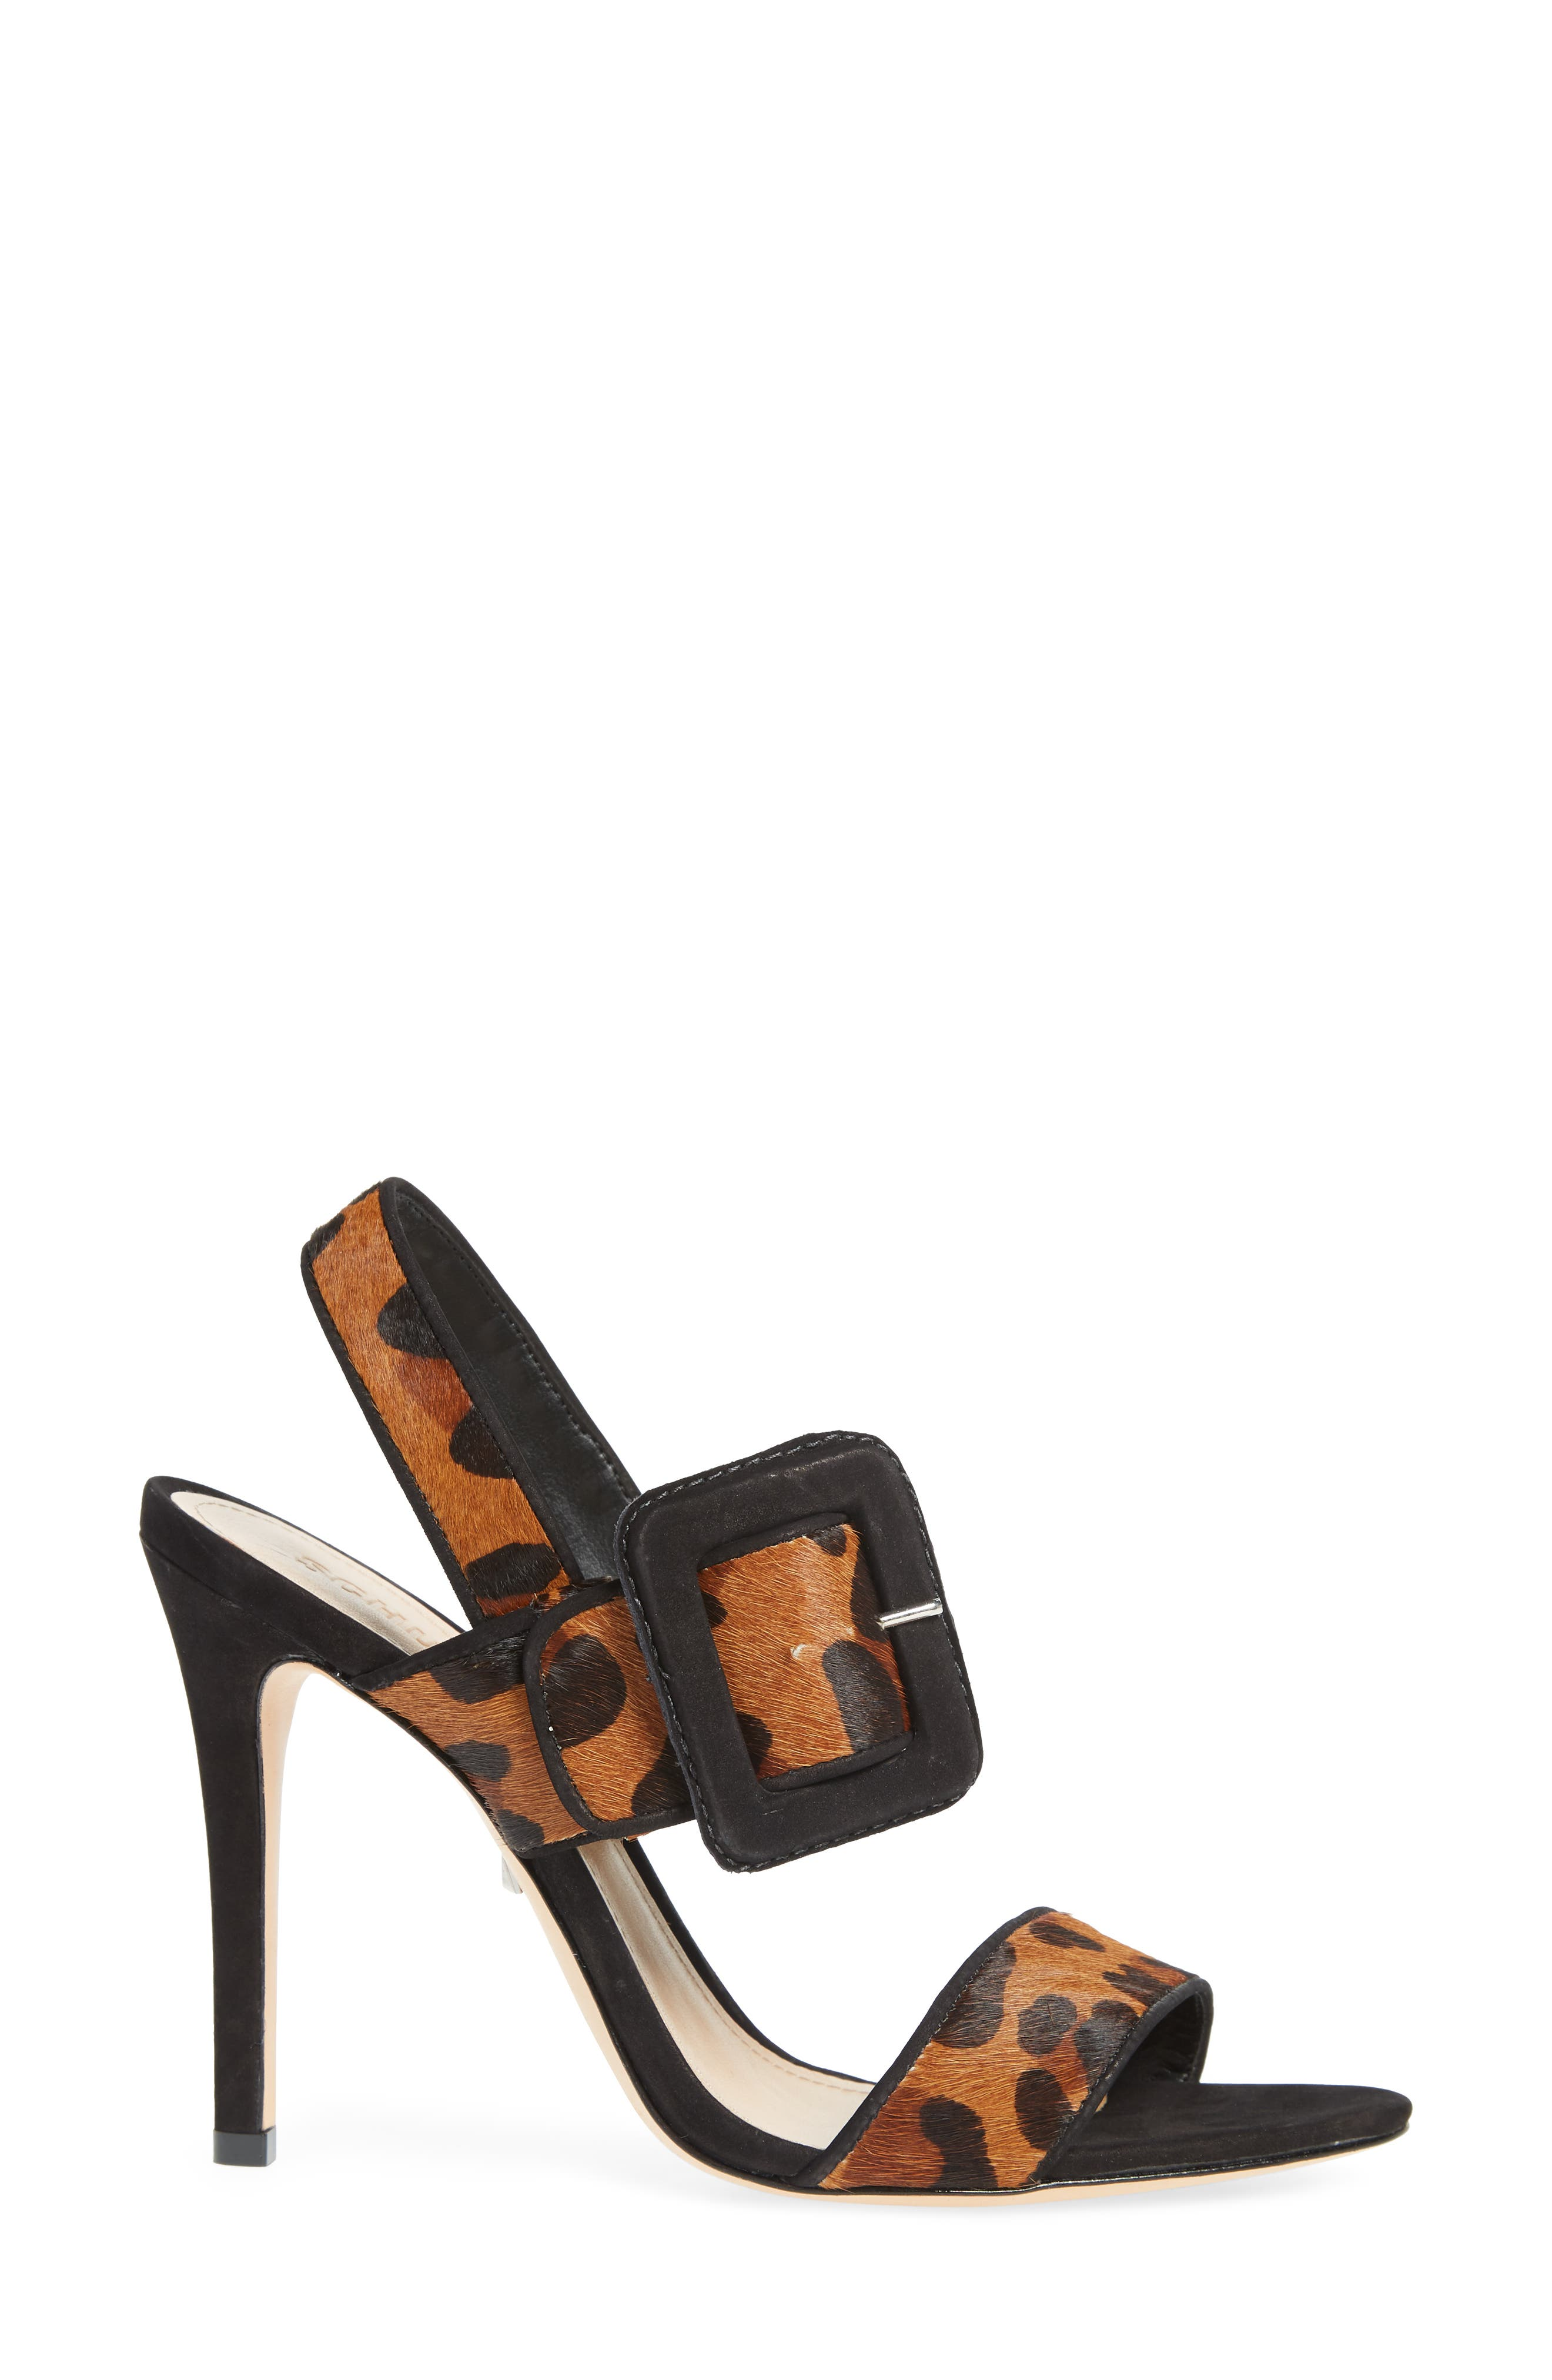 Lucci Genuine Calf Hair Sandal,                             Alternate thumbnail 3, color,                             NATURAL/ BLACK